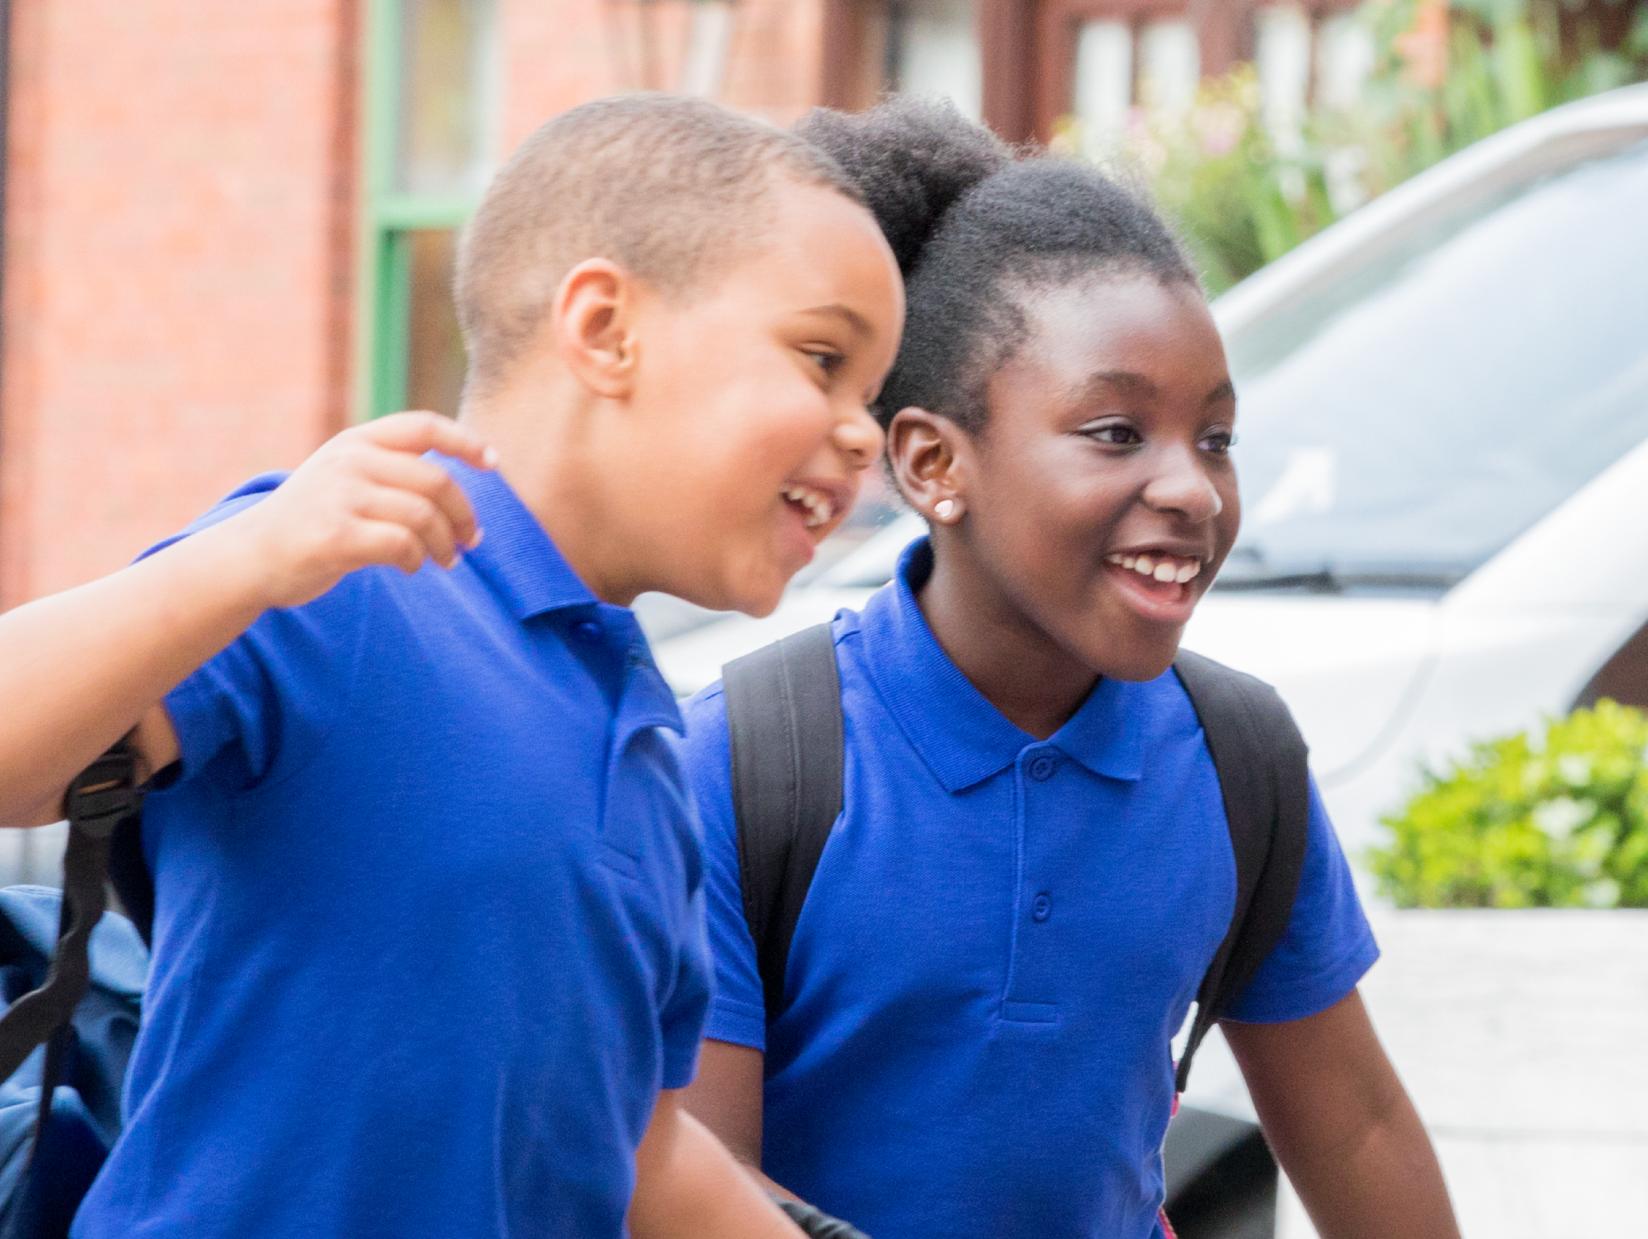 Children returning back to school